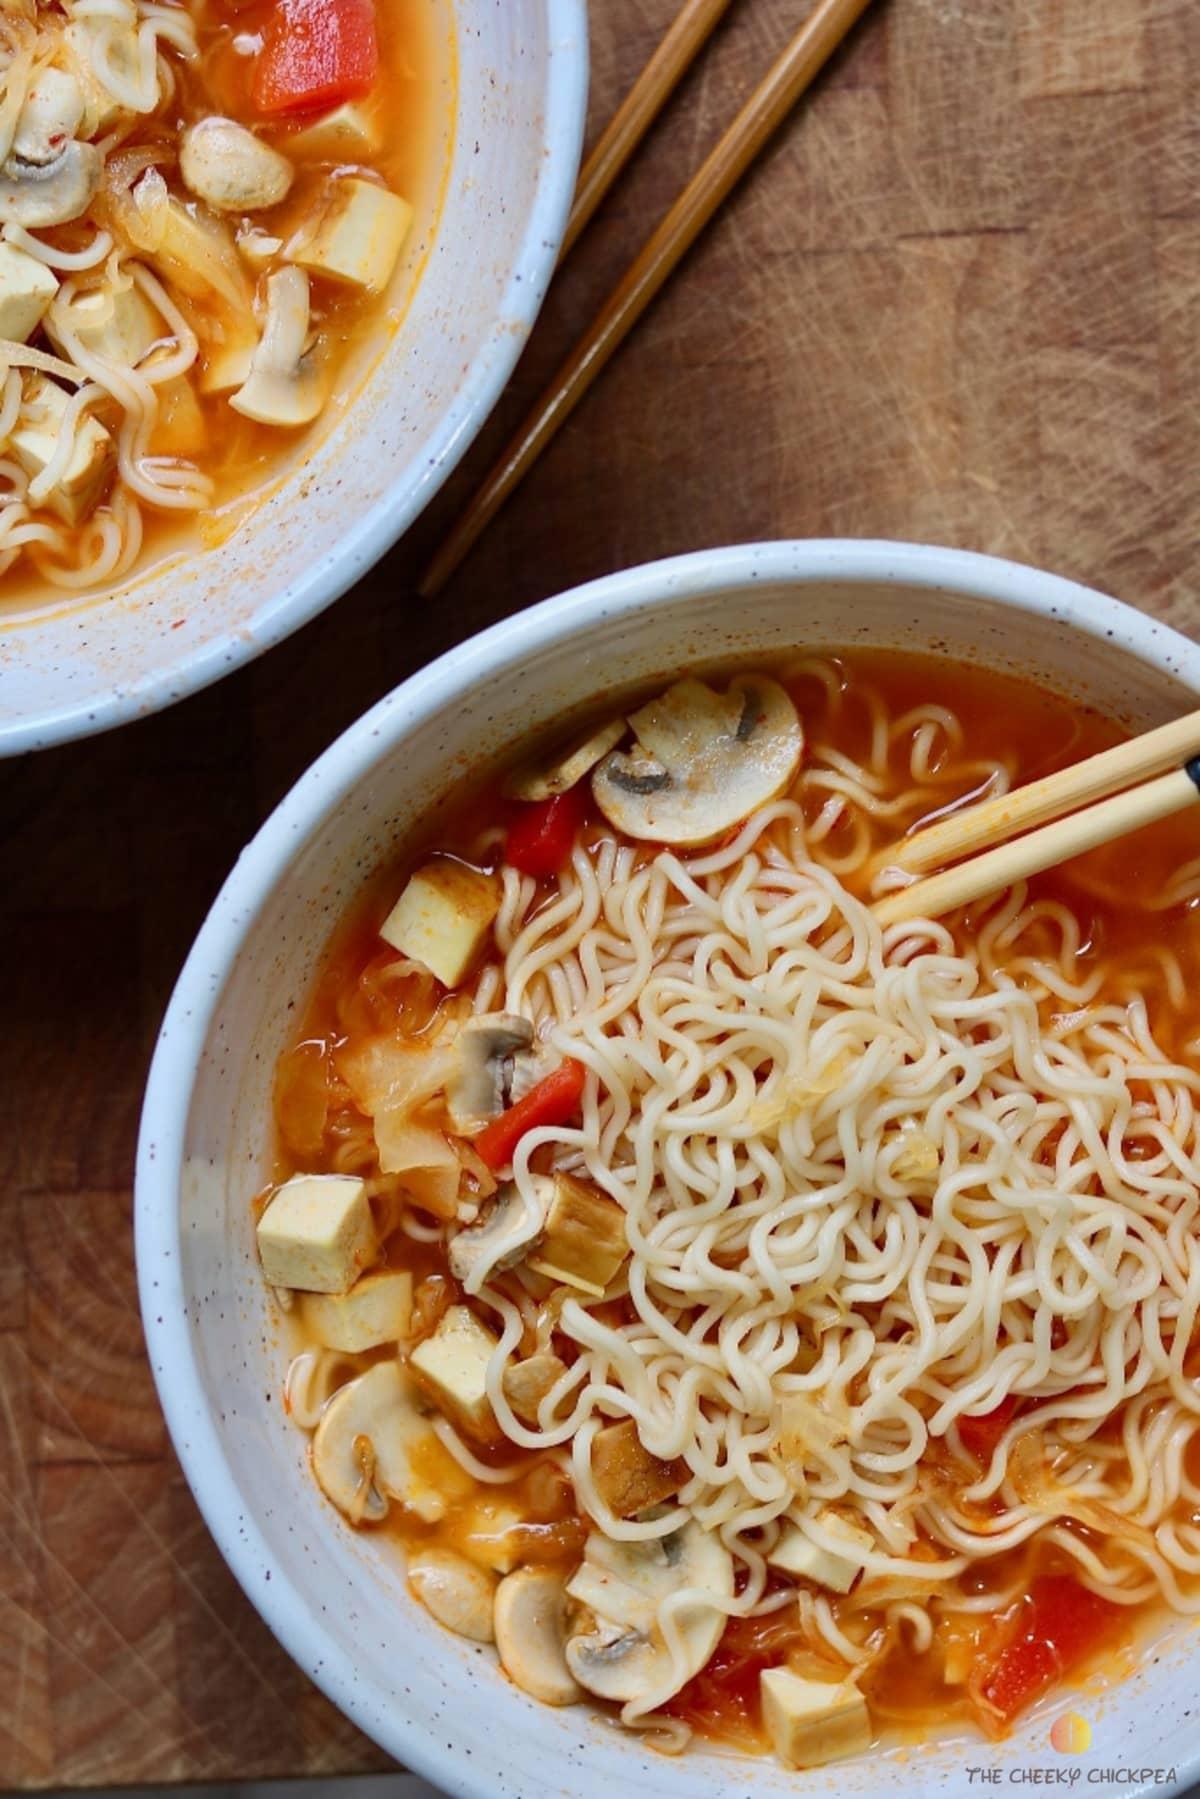 ramen noodle soup in a white bowl with chopsticks